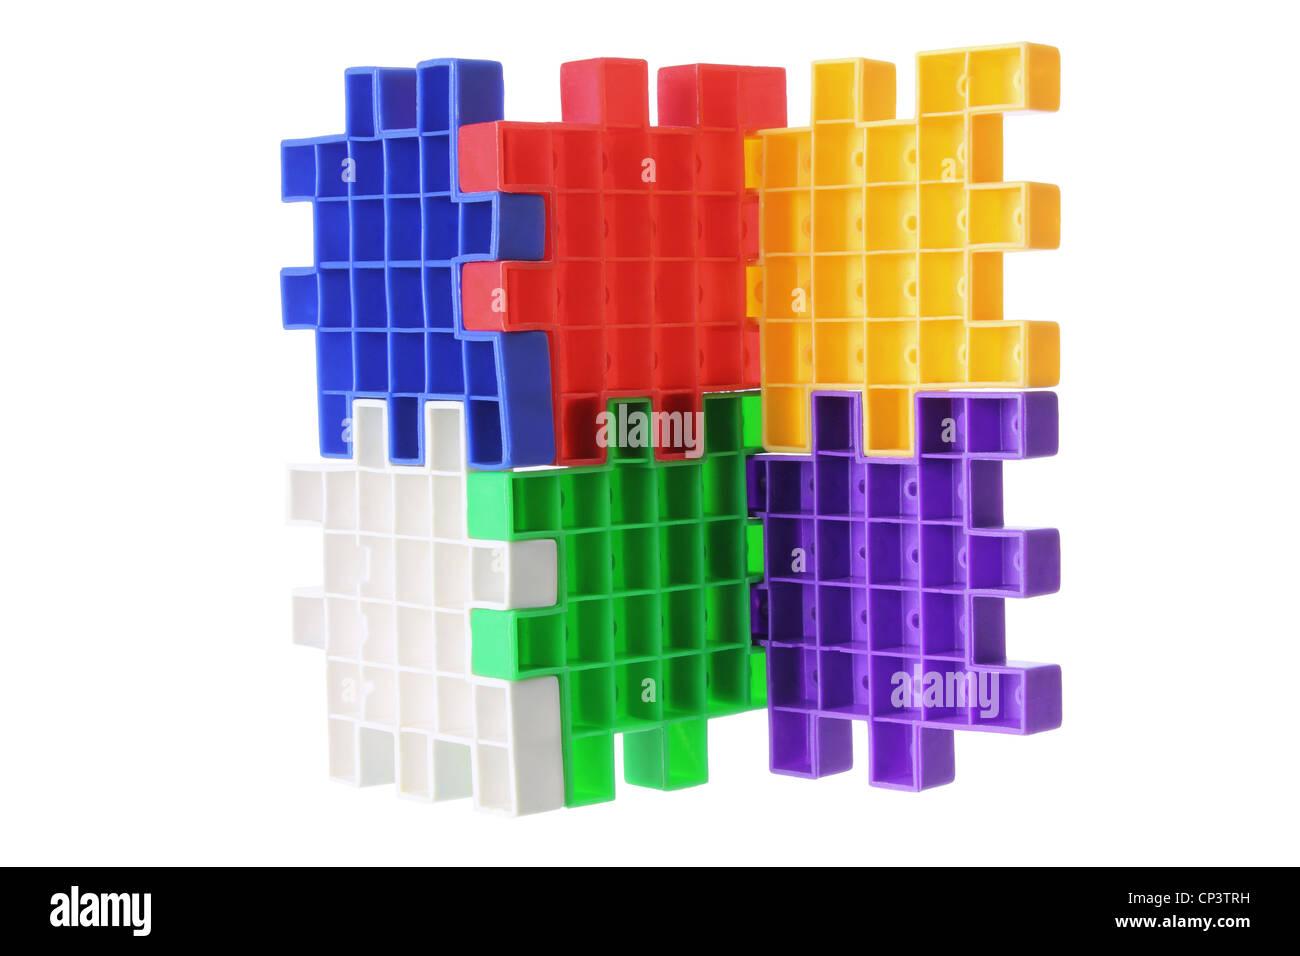 Plastic Puzzle Pieces - Stock Image